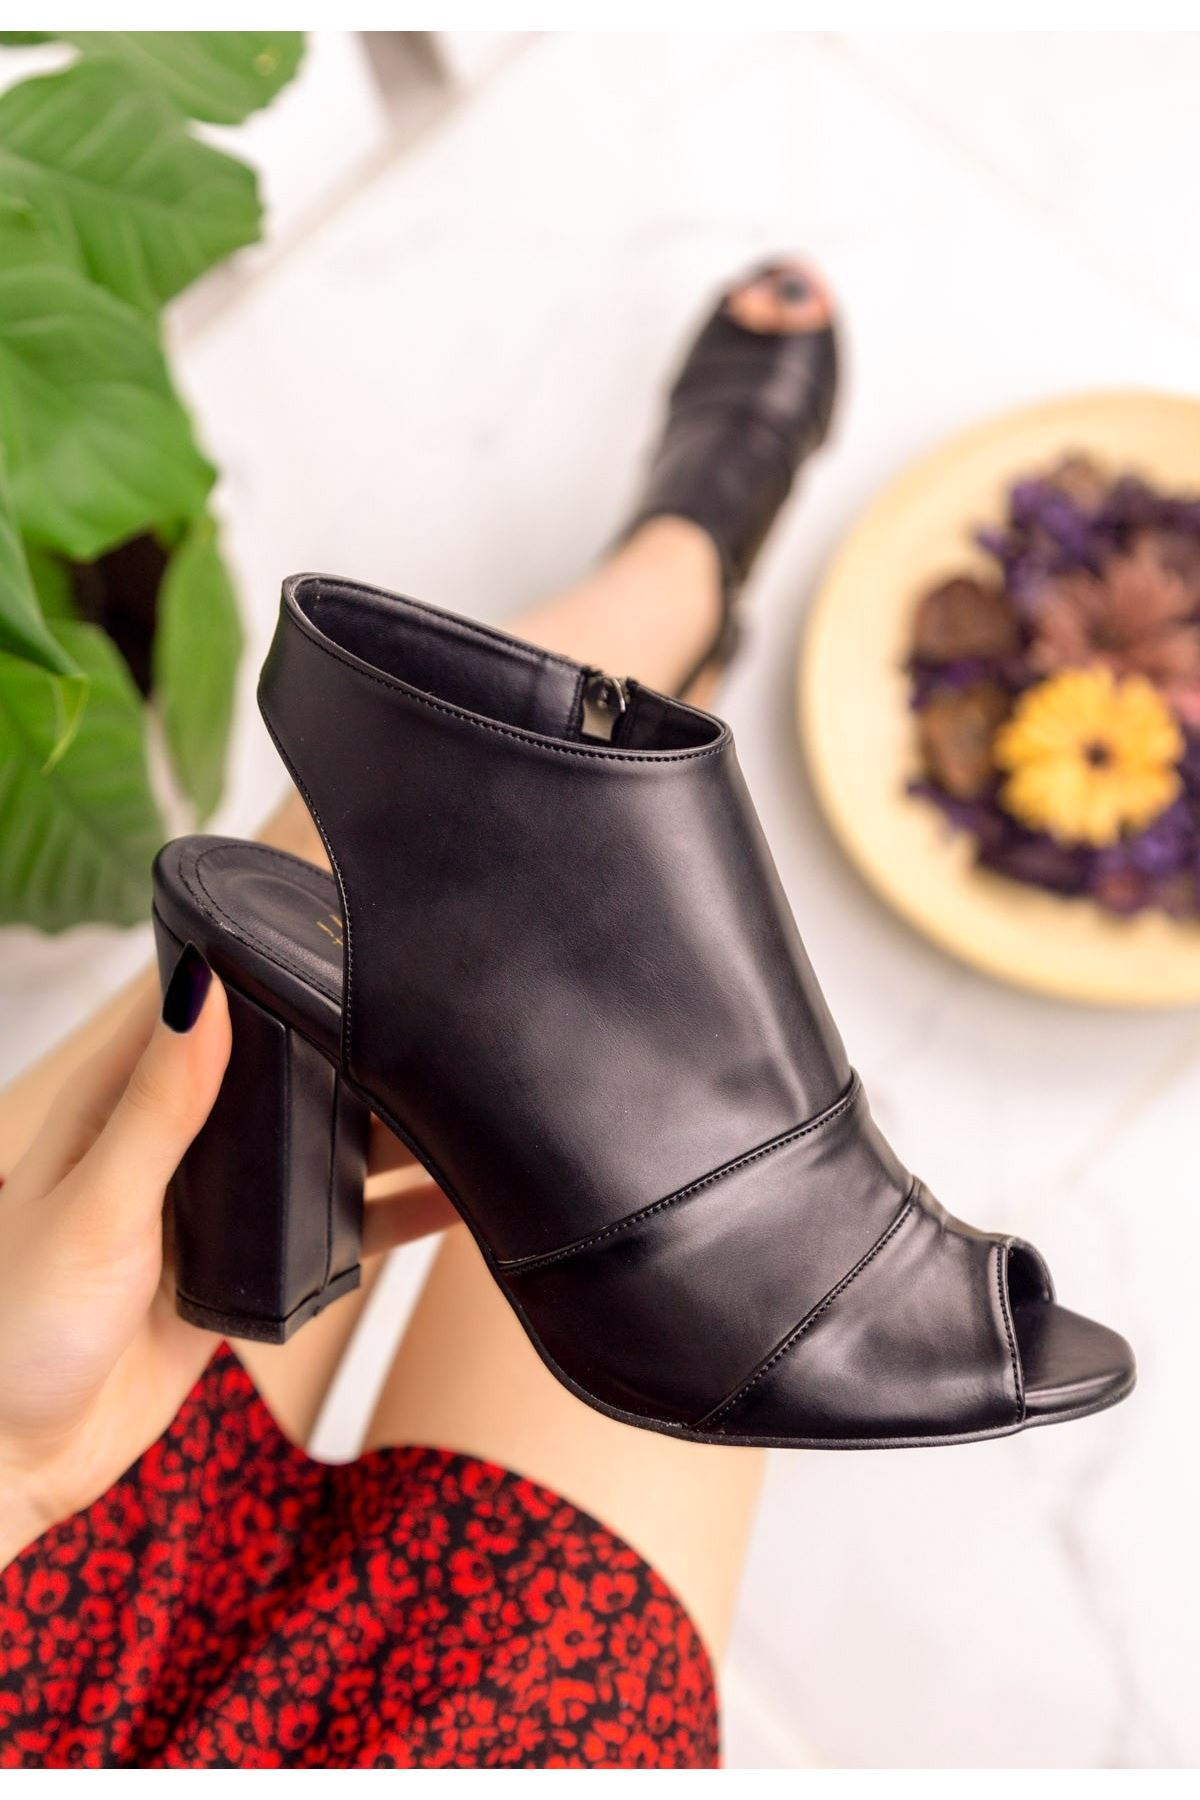 Dolly Siyah Cilt Topuklu Ayakkabı